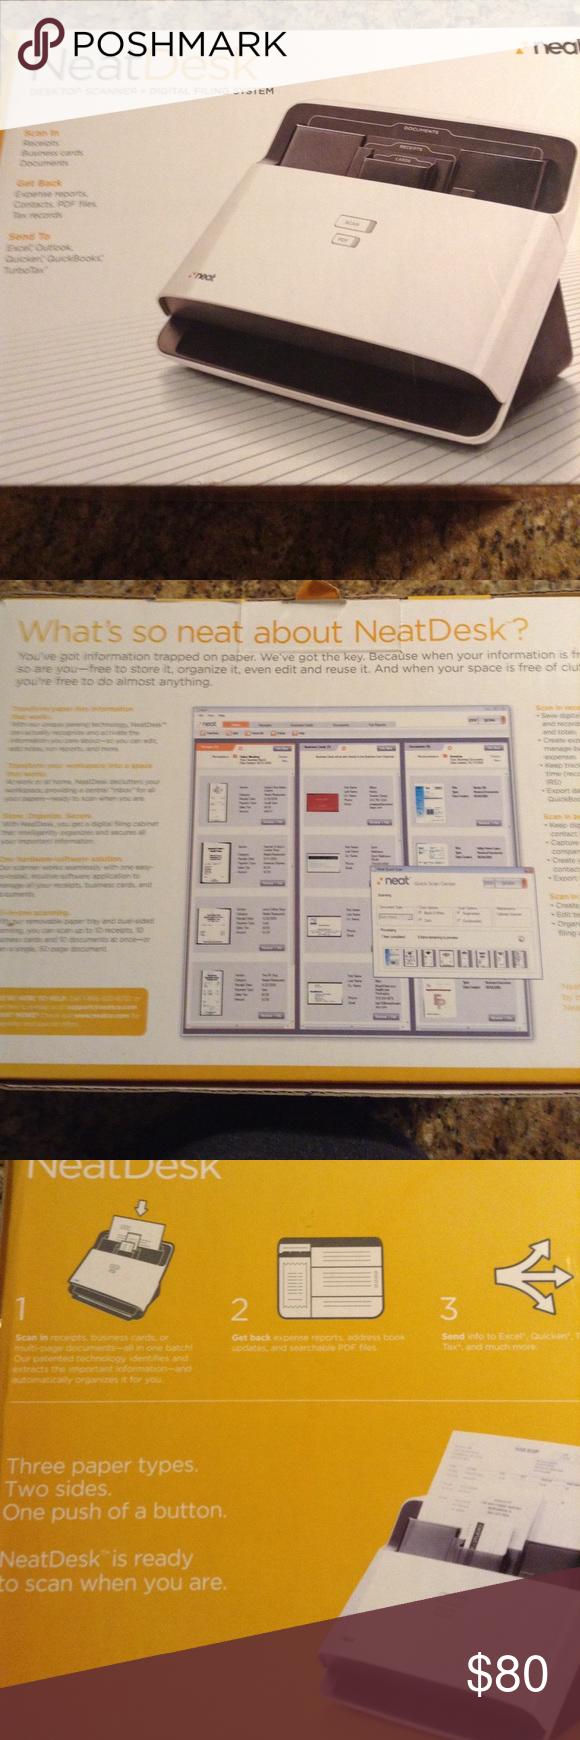 Neat Desk Desktop Scanner Digital Filing System Neat Desk Filing System Digital Filing System